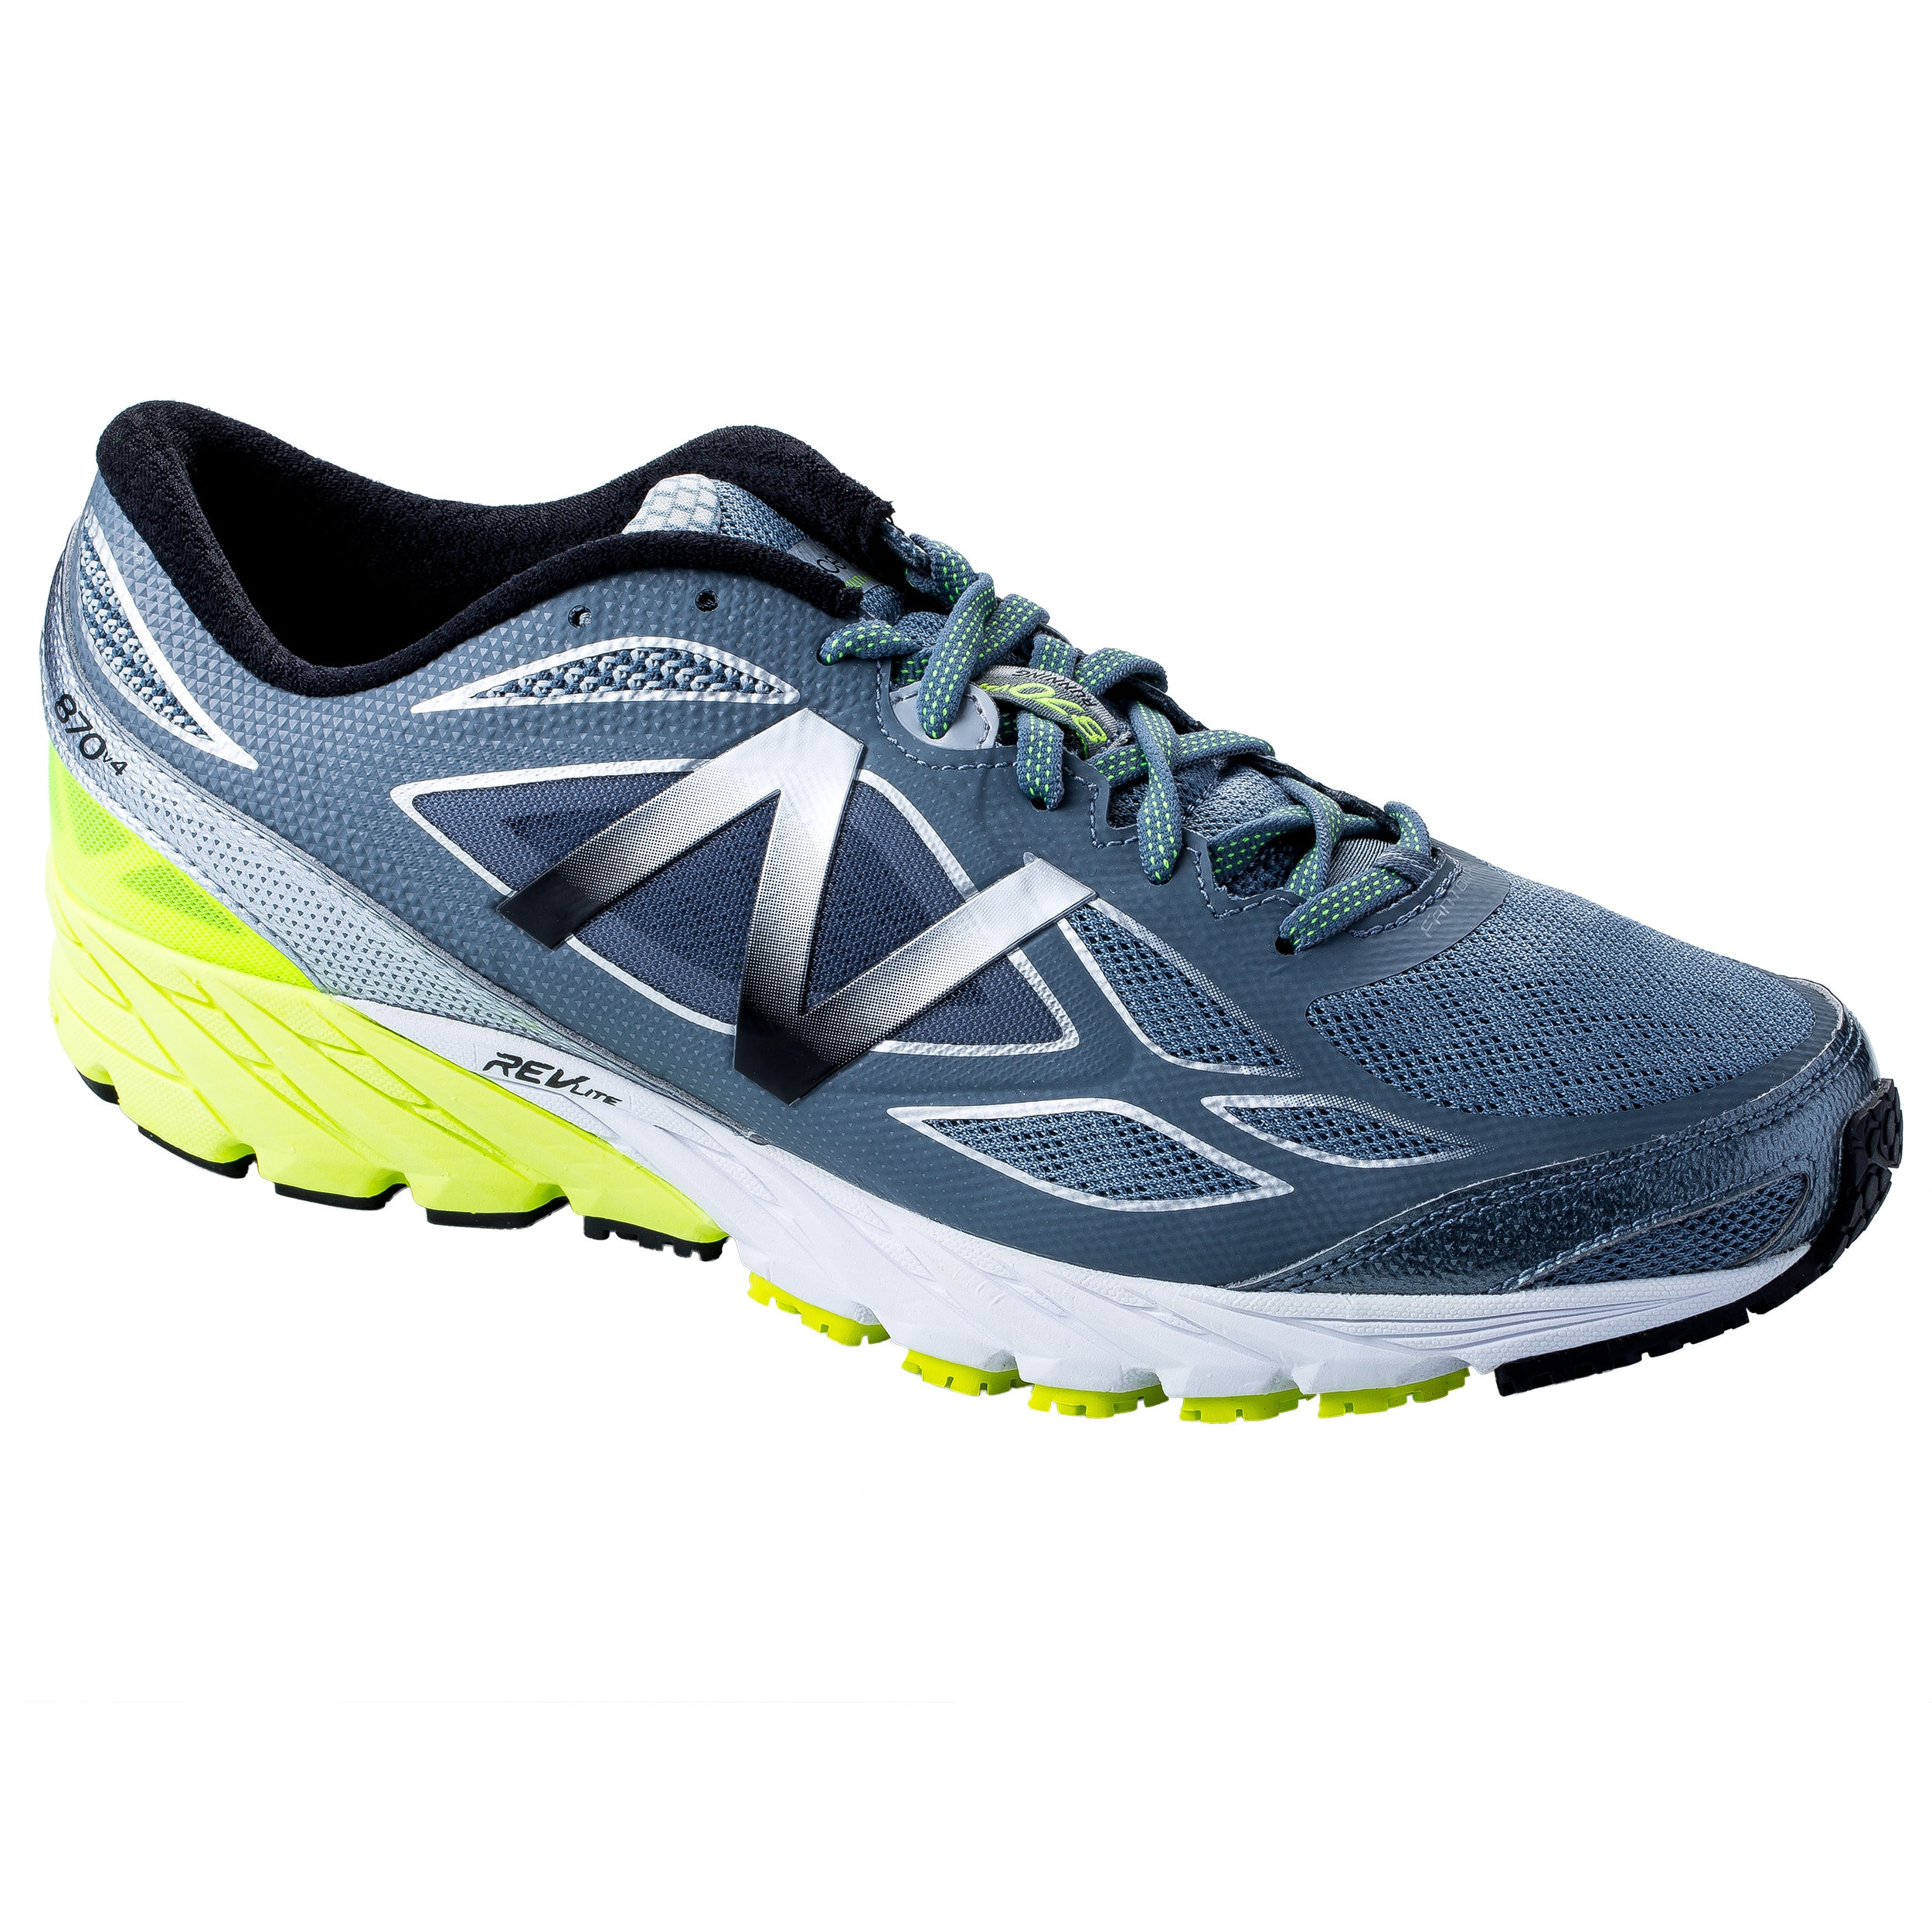 Shop New Balance M870GY4 Men's 870v4